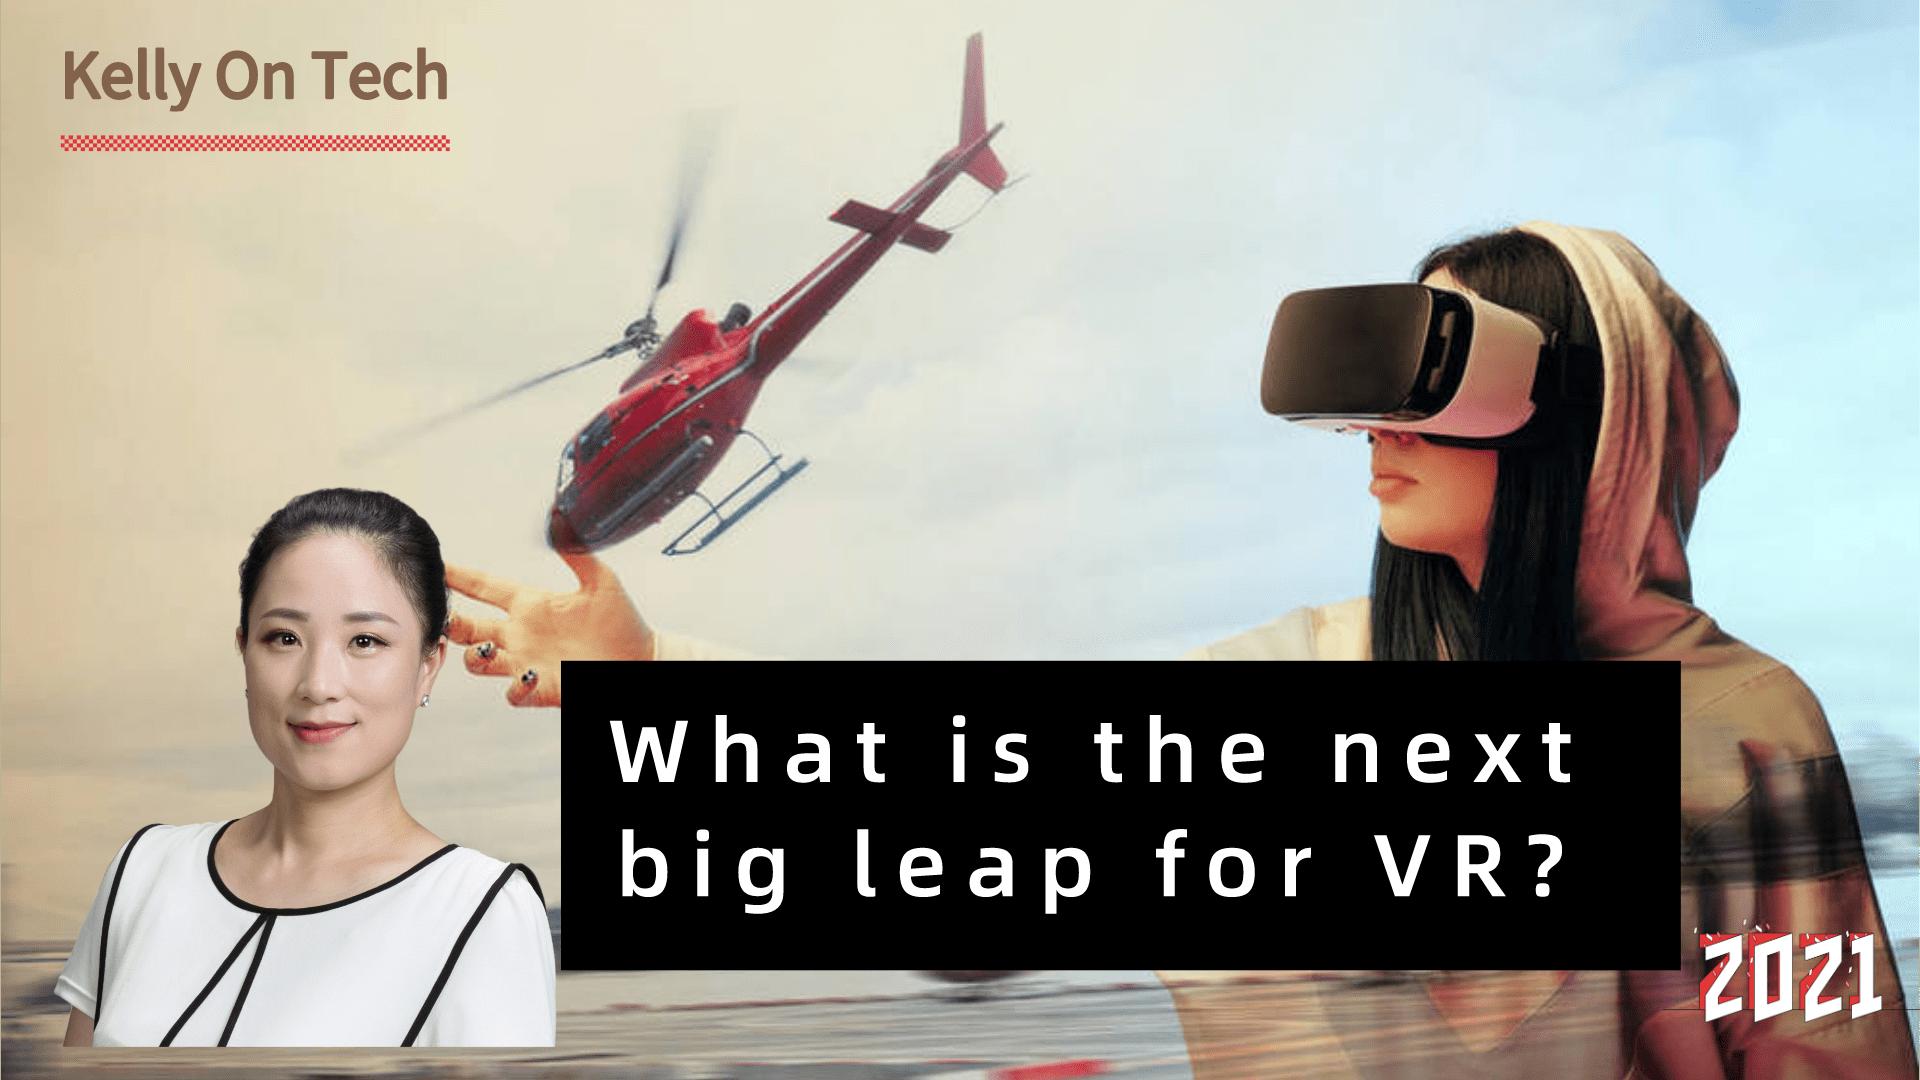 The next big leap of virtual reality_KellyOnTech